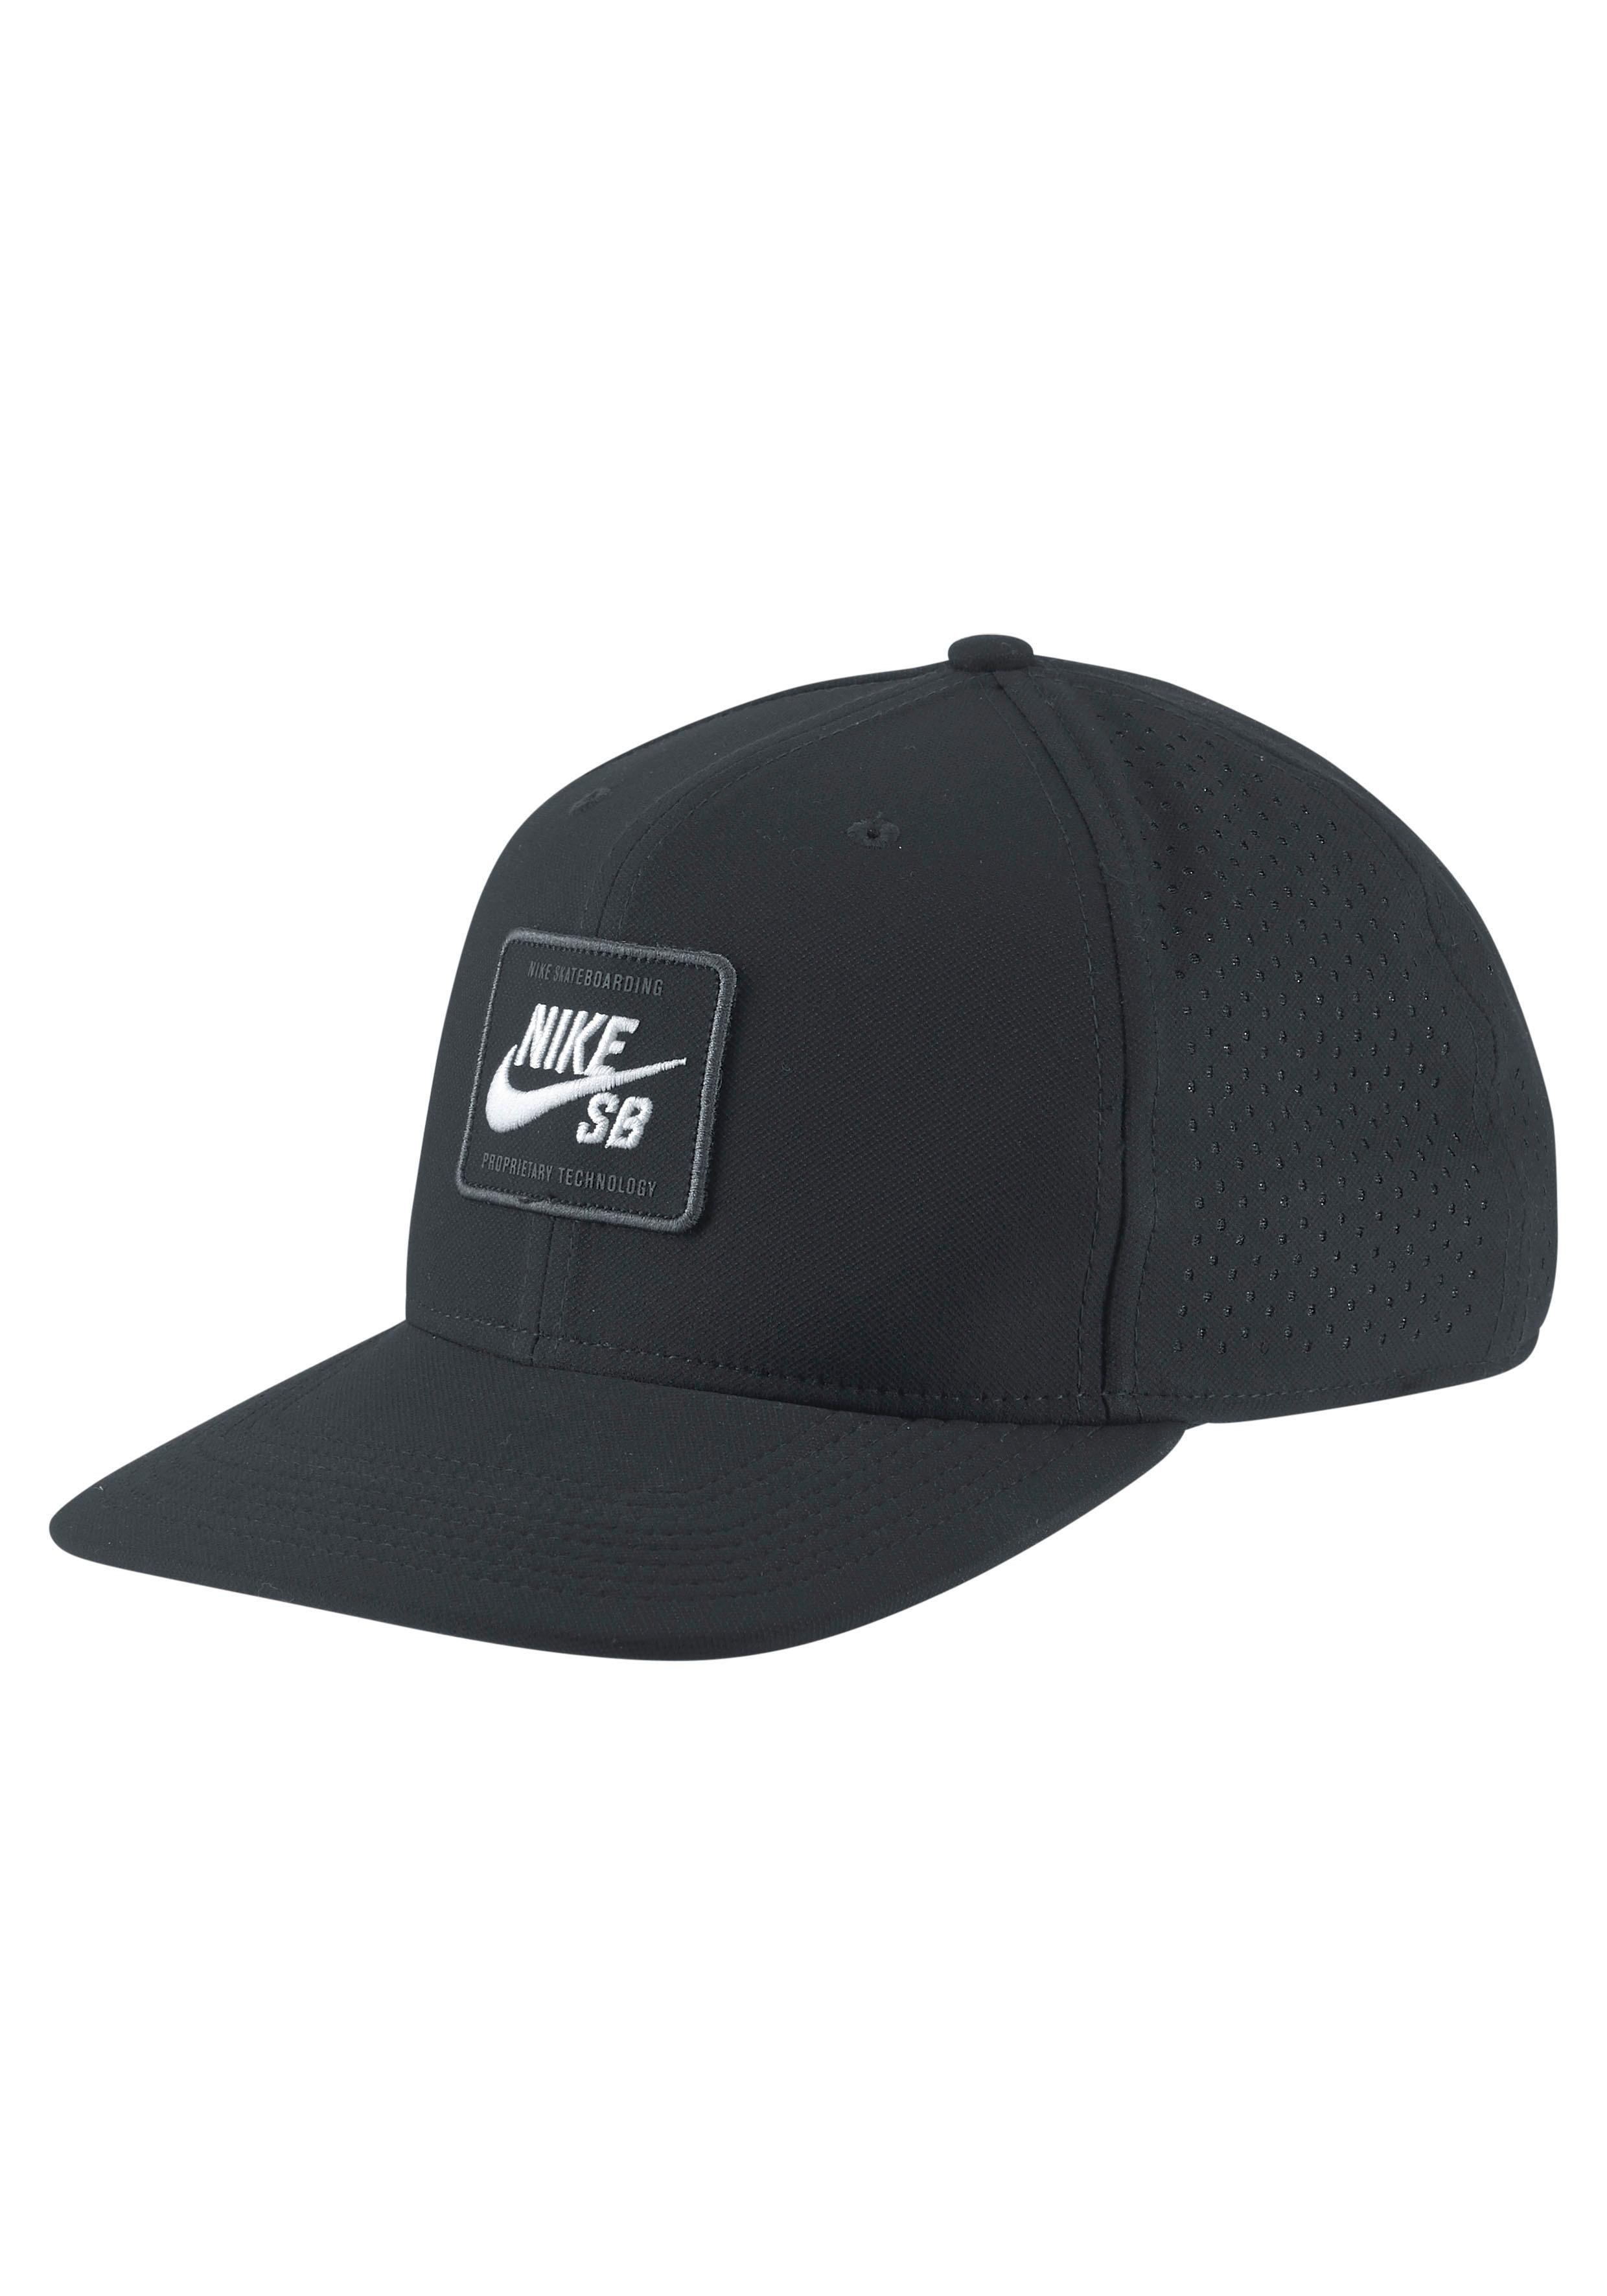 Nike SB baseballcap »Nike SB AeroBill Pro 2.0 Skate Hat« bestellen: 30 dagen bedenktijd